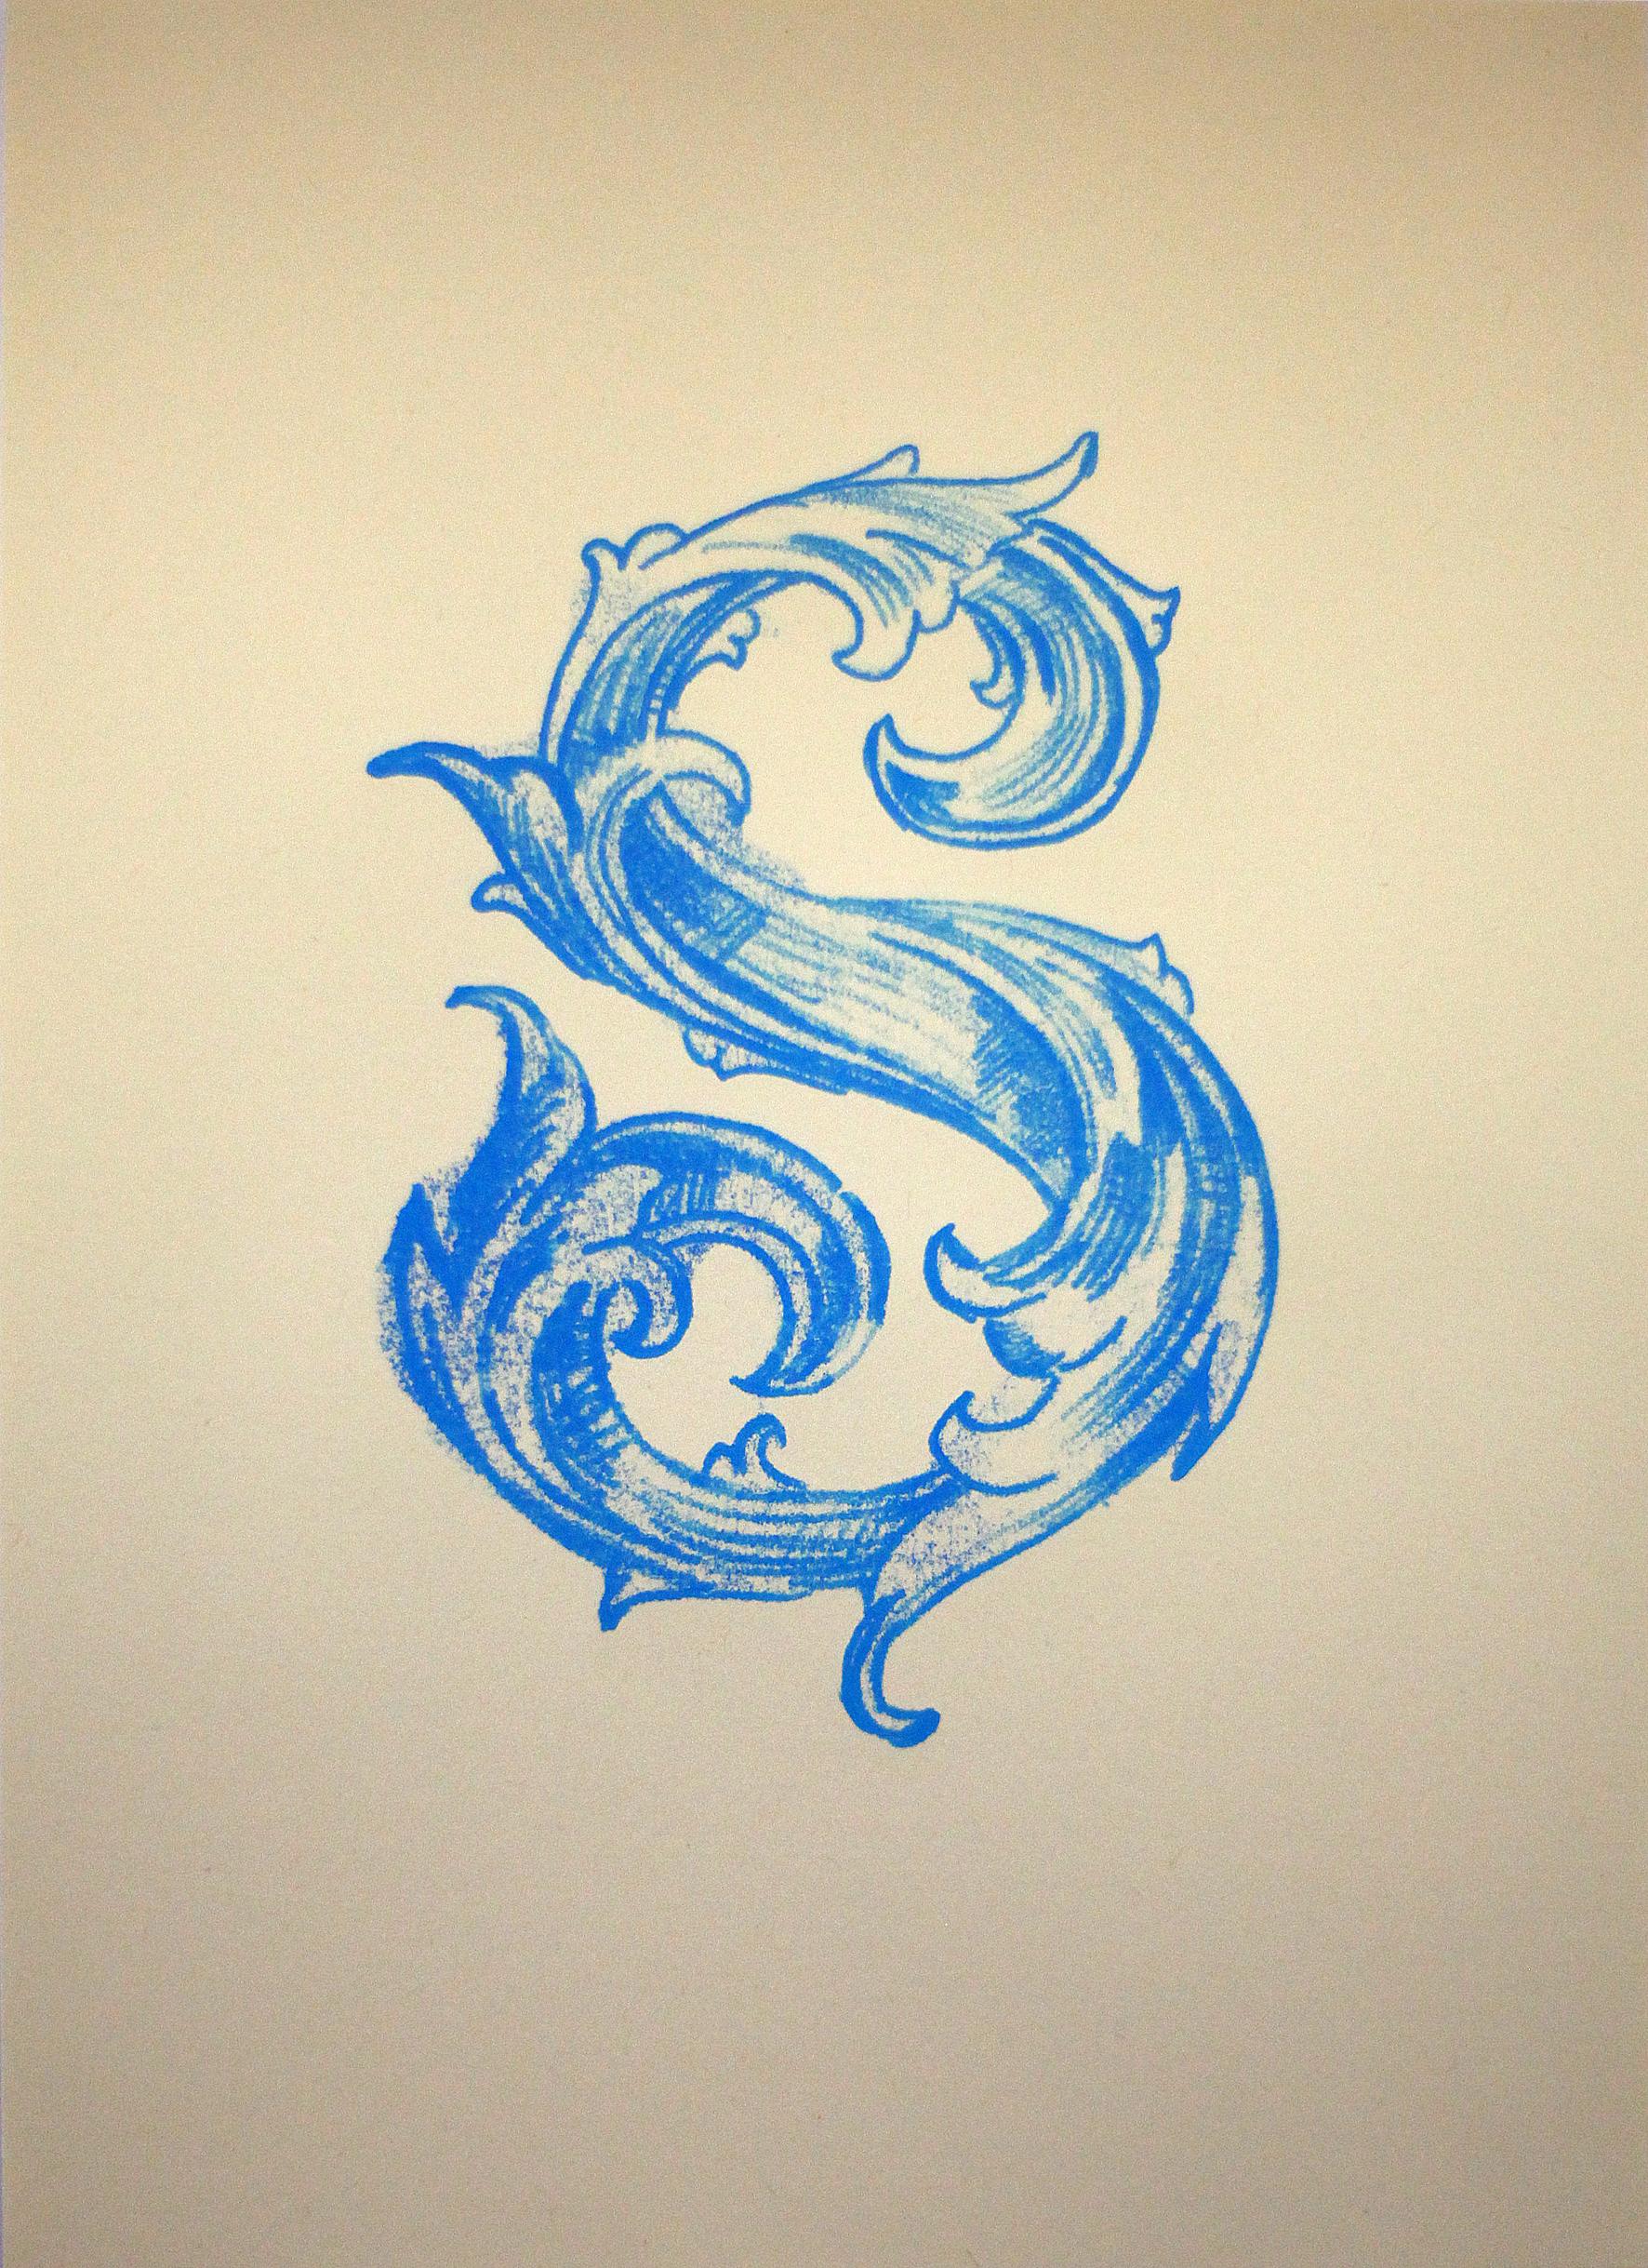 Monoprint on paper, 21 x 29.5 cm